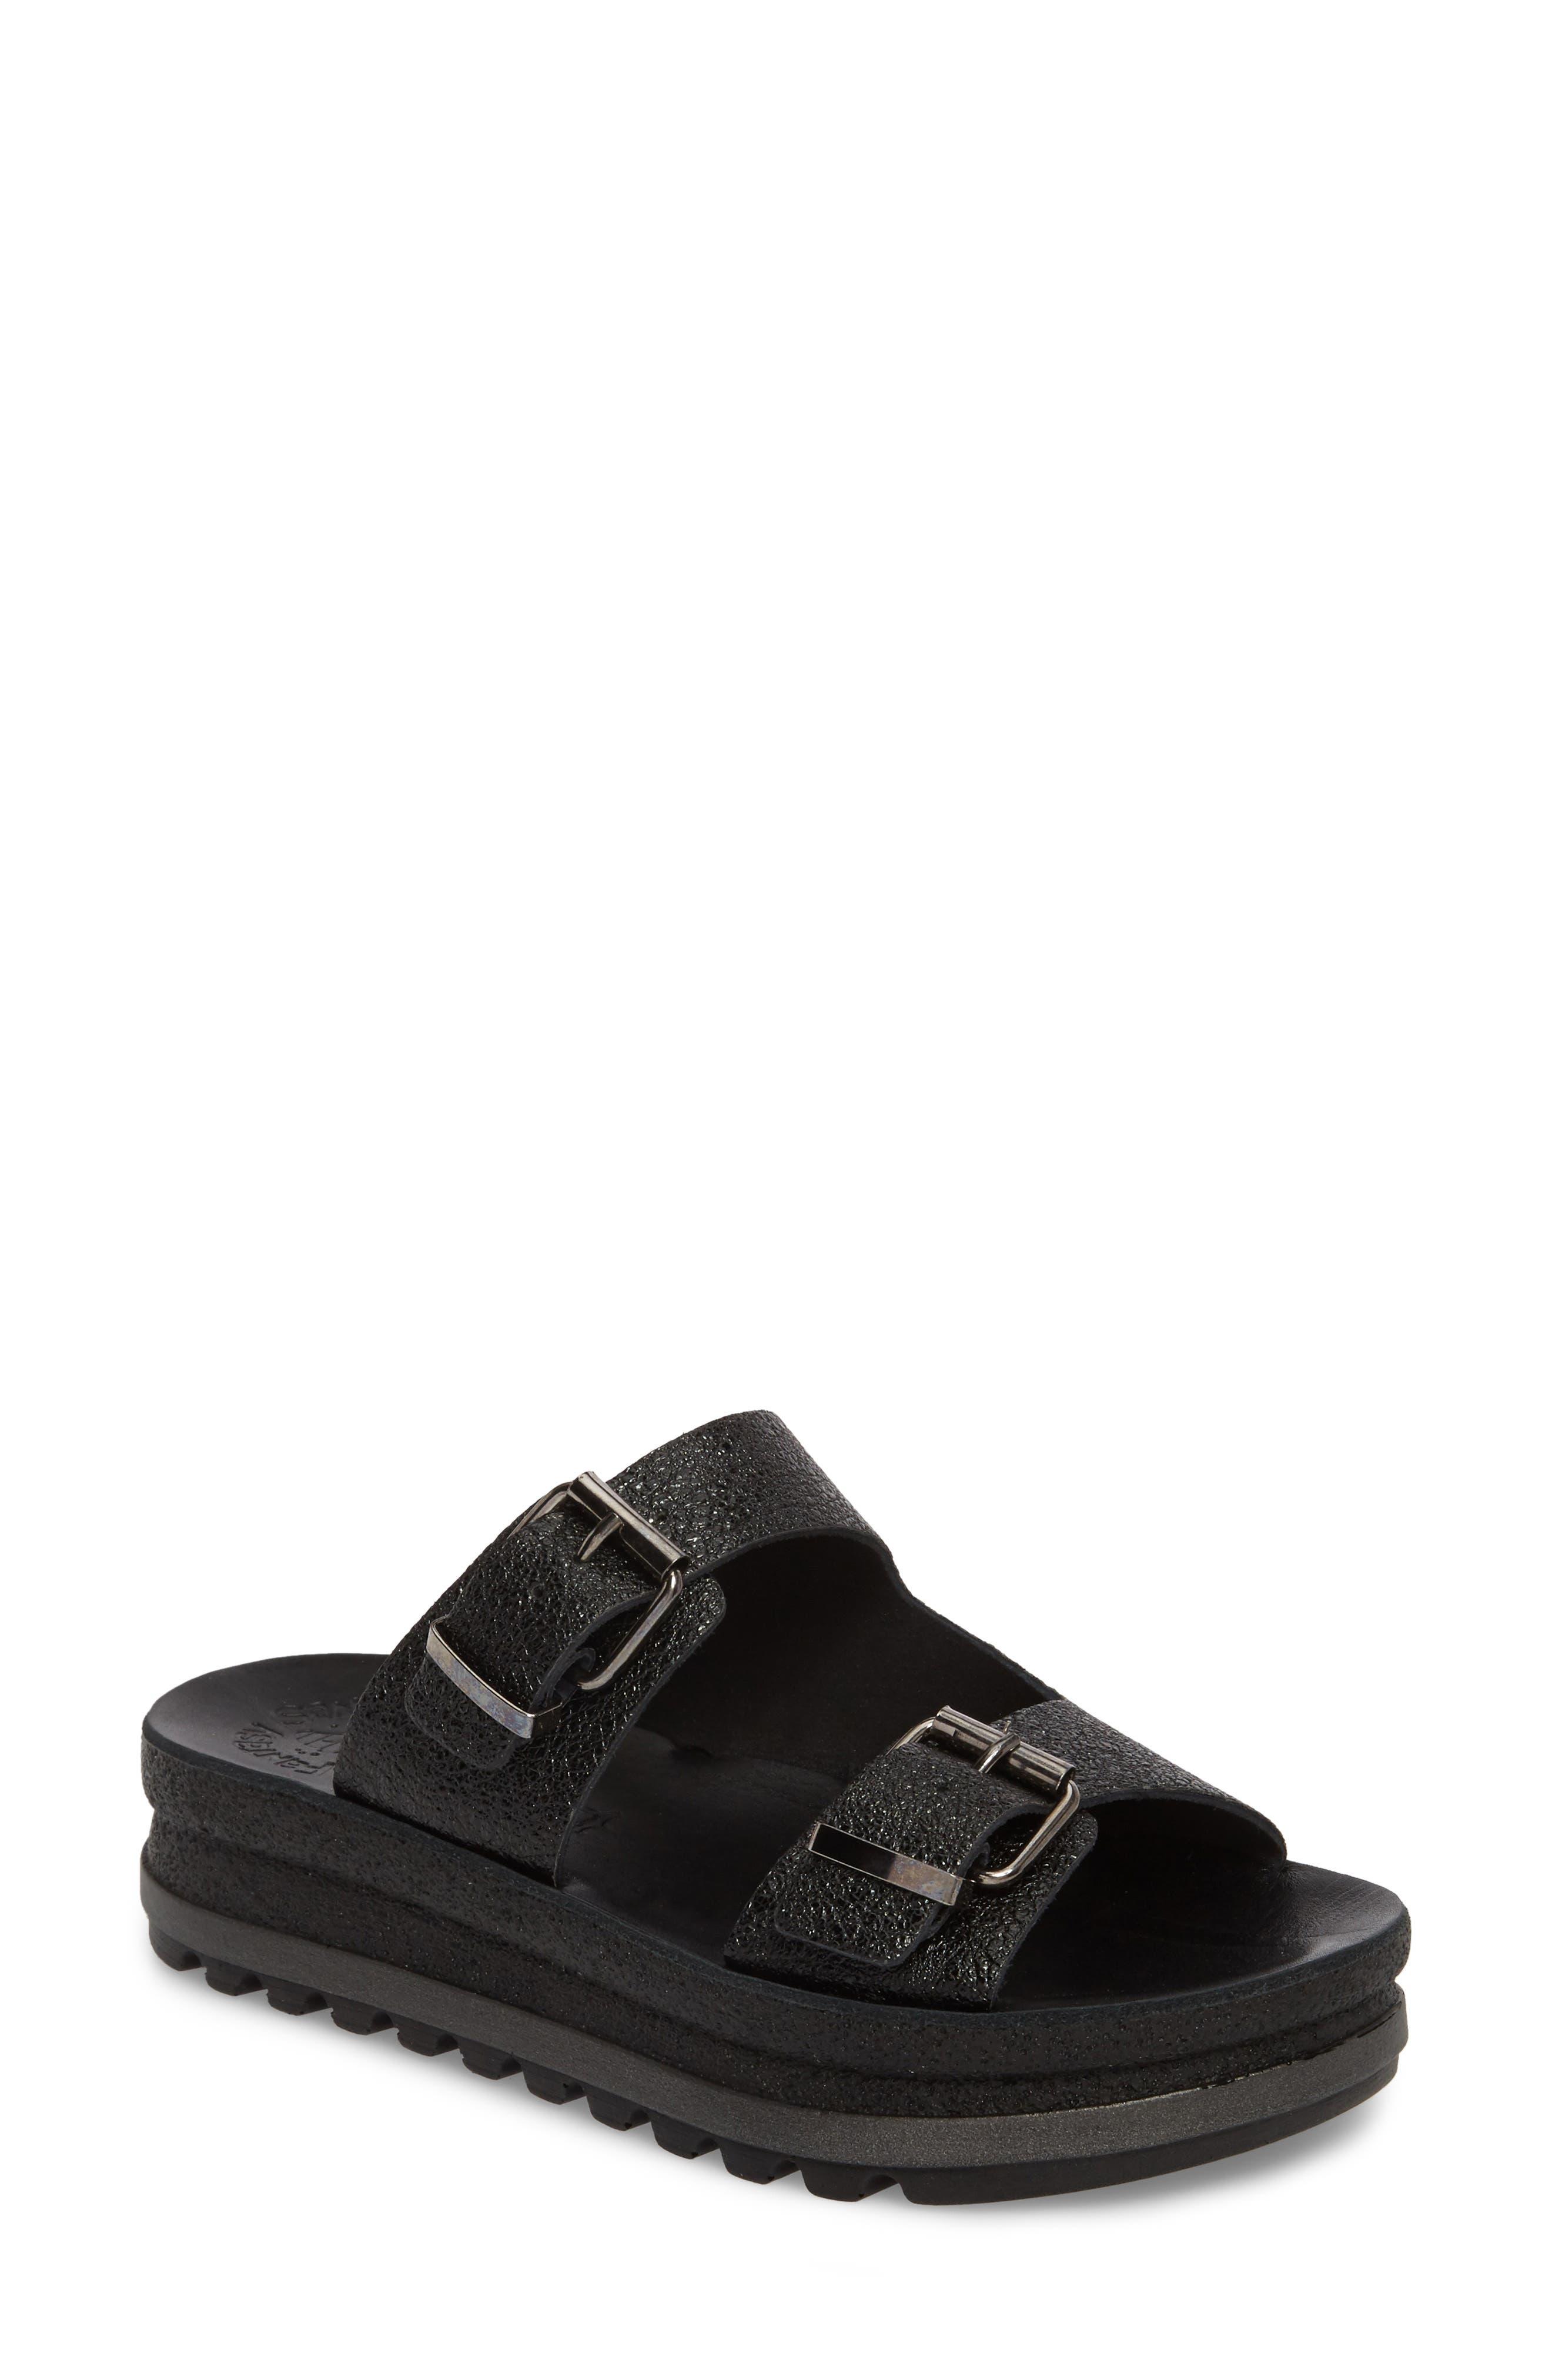 Melanie Platform Sandal,                         Main,                         color, Black Spacey Leather